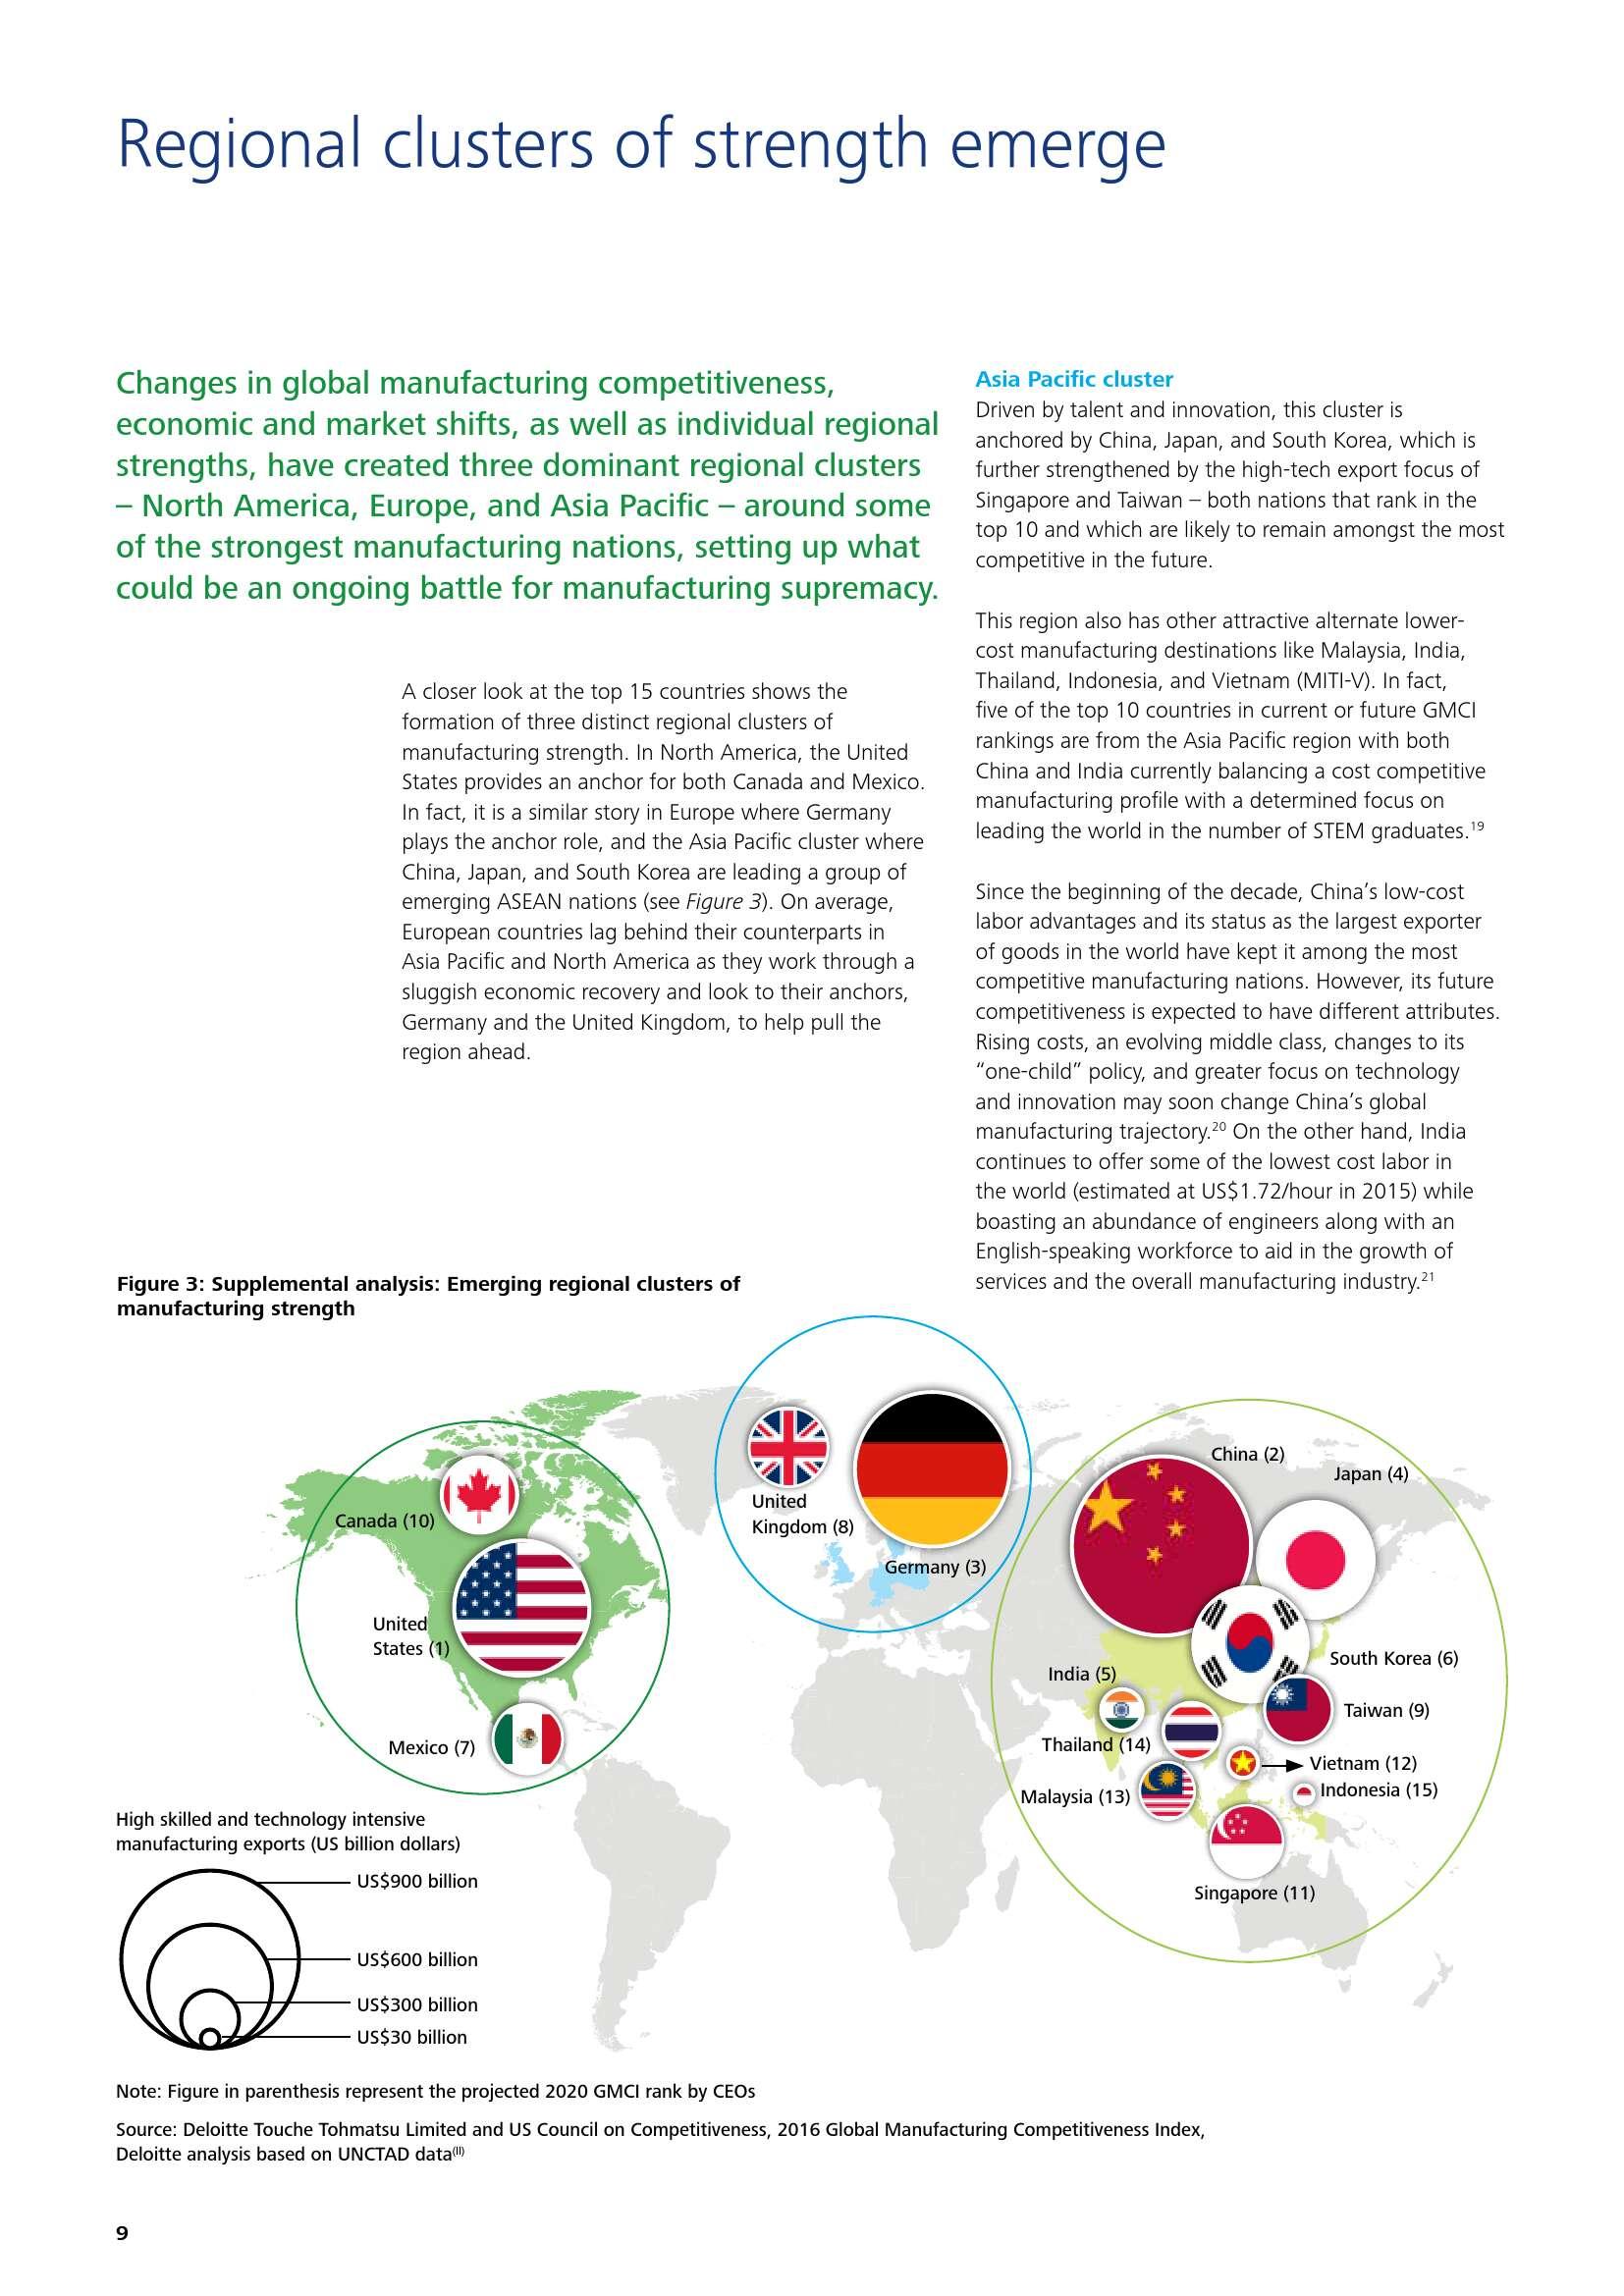 deloitte-cn-global-mfg-competitiveness-index-2016-en-160401_000012